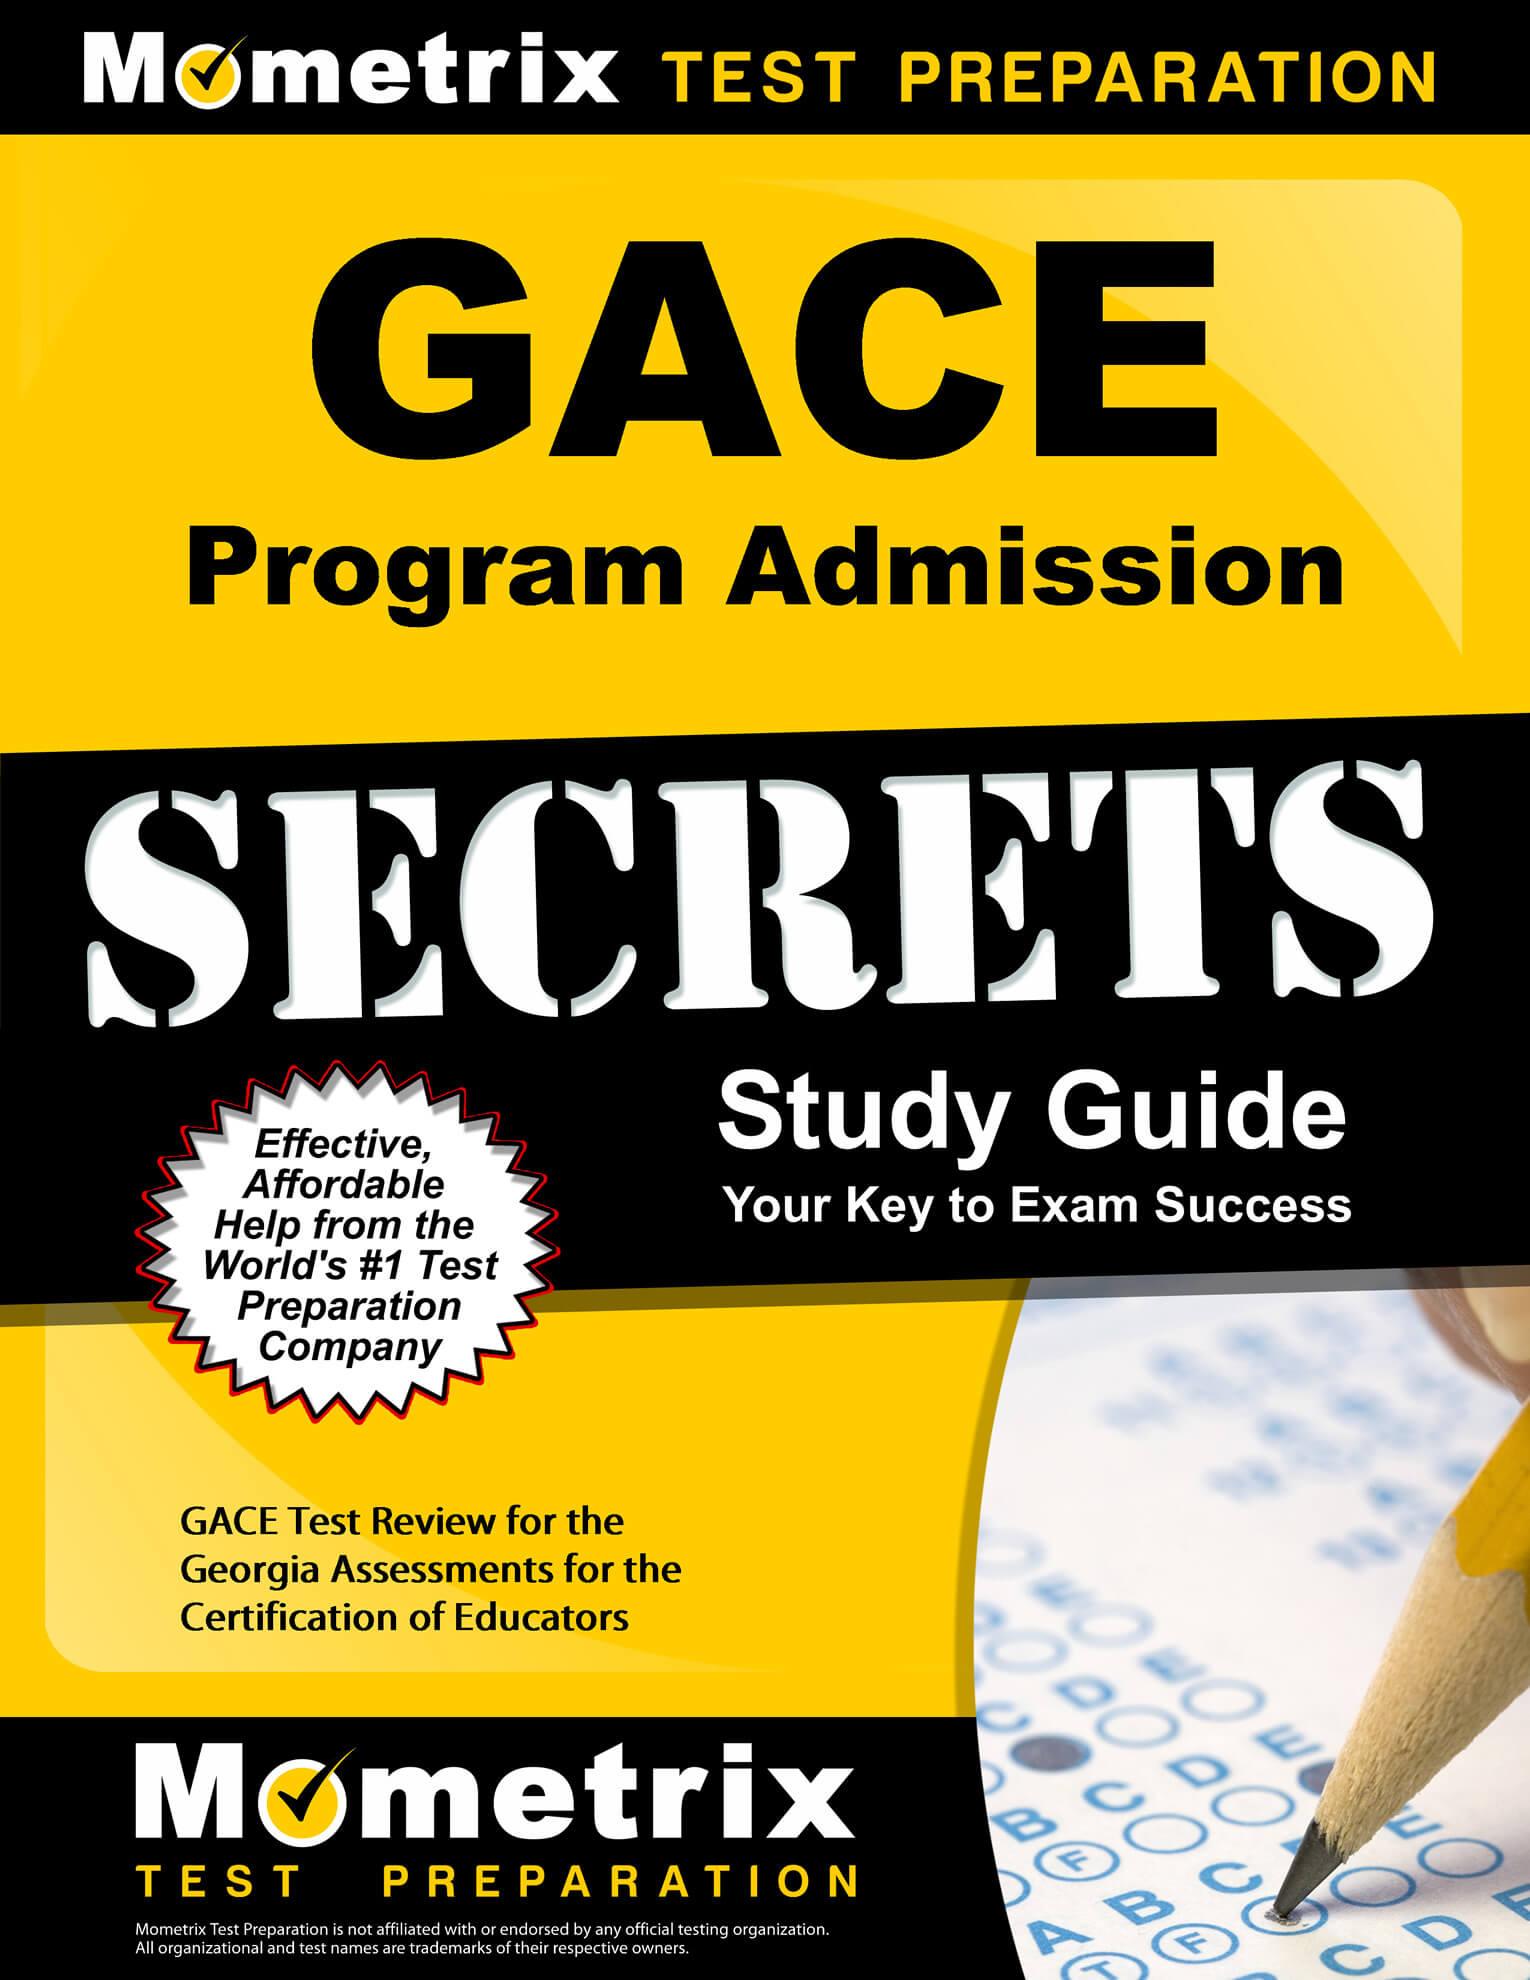 GACE Program Admission Study Guide